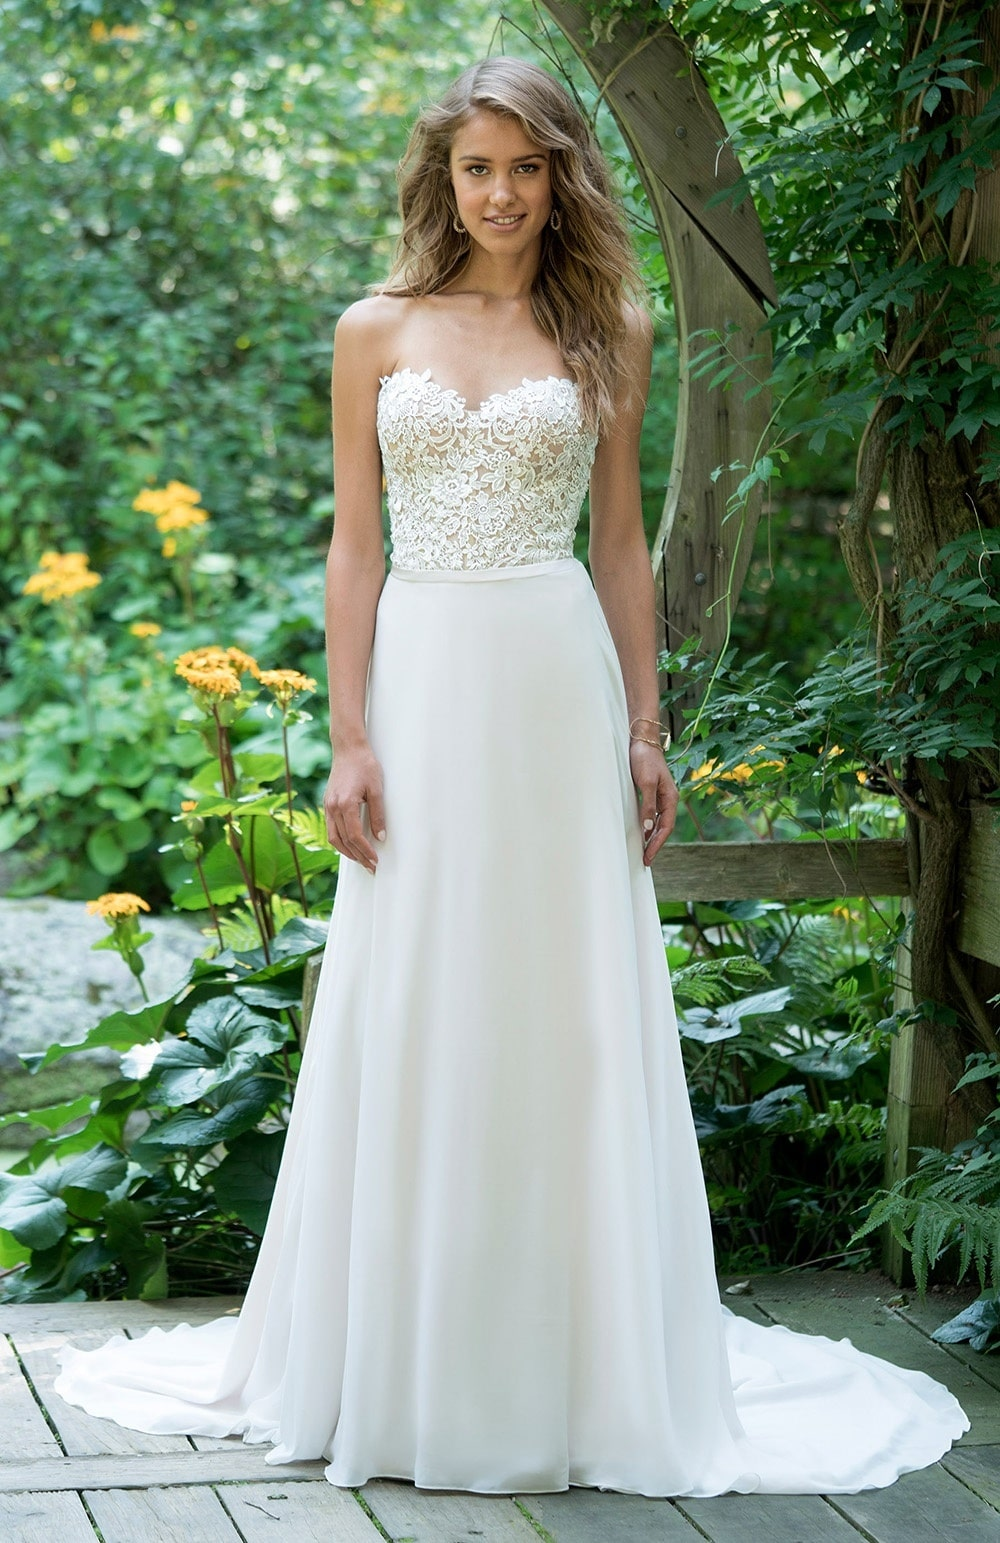 Robe de mariée Modèle Nickie – 66019